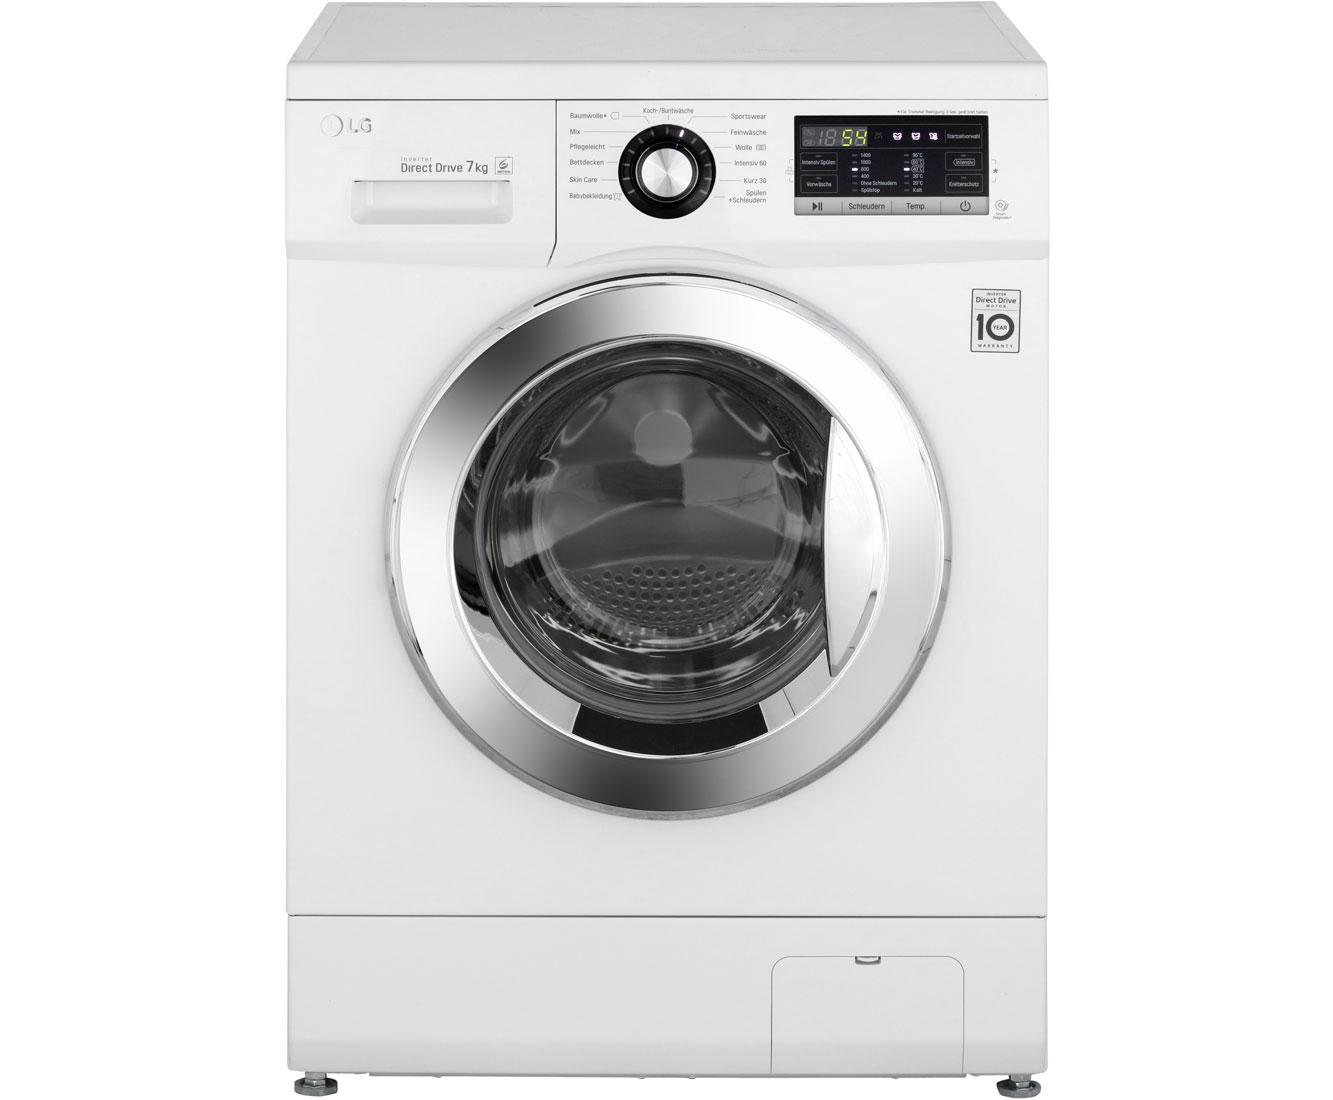 lg f1496qd3ht waschmaschine waschmaschinen. Black Bedroom Furniture Sets. Home Design Ideas